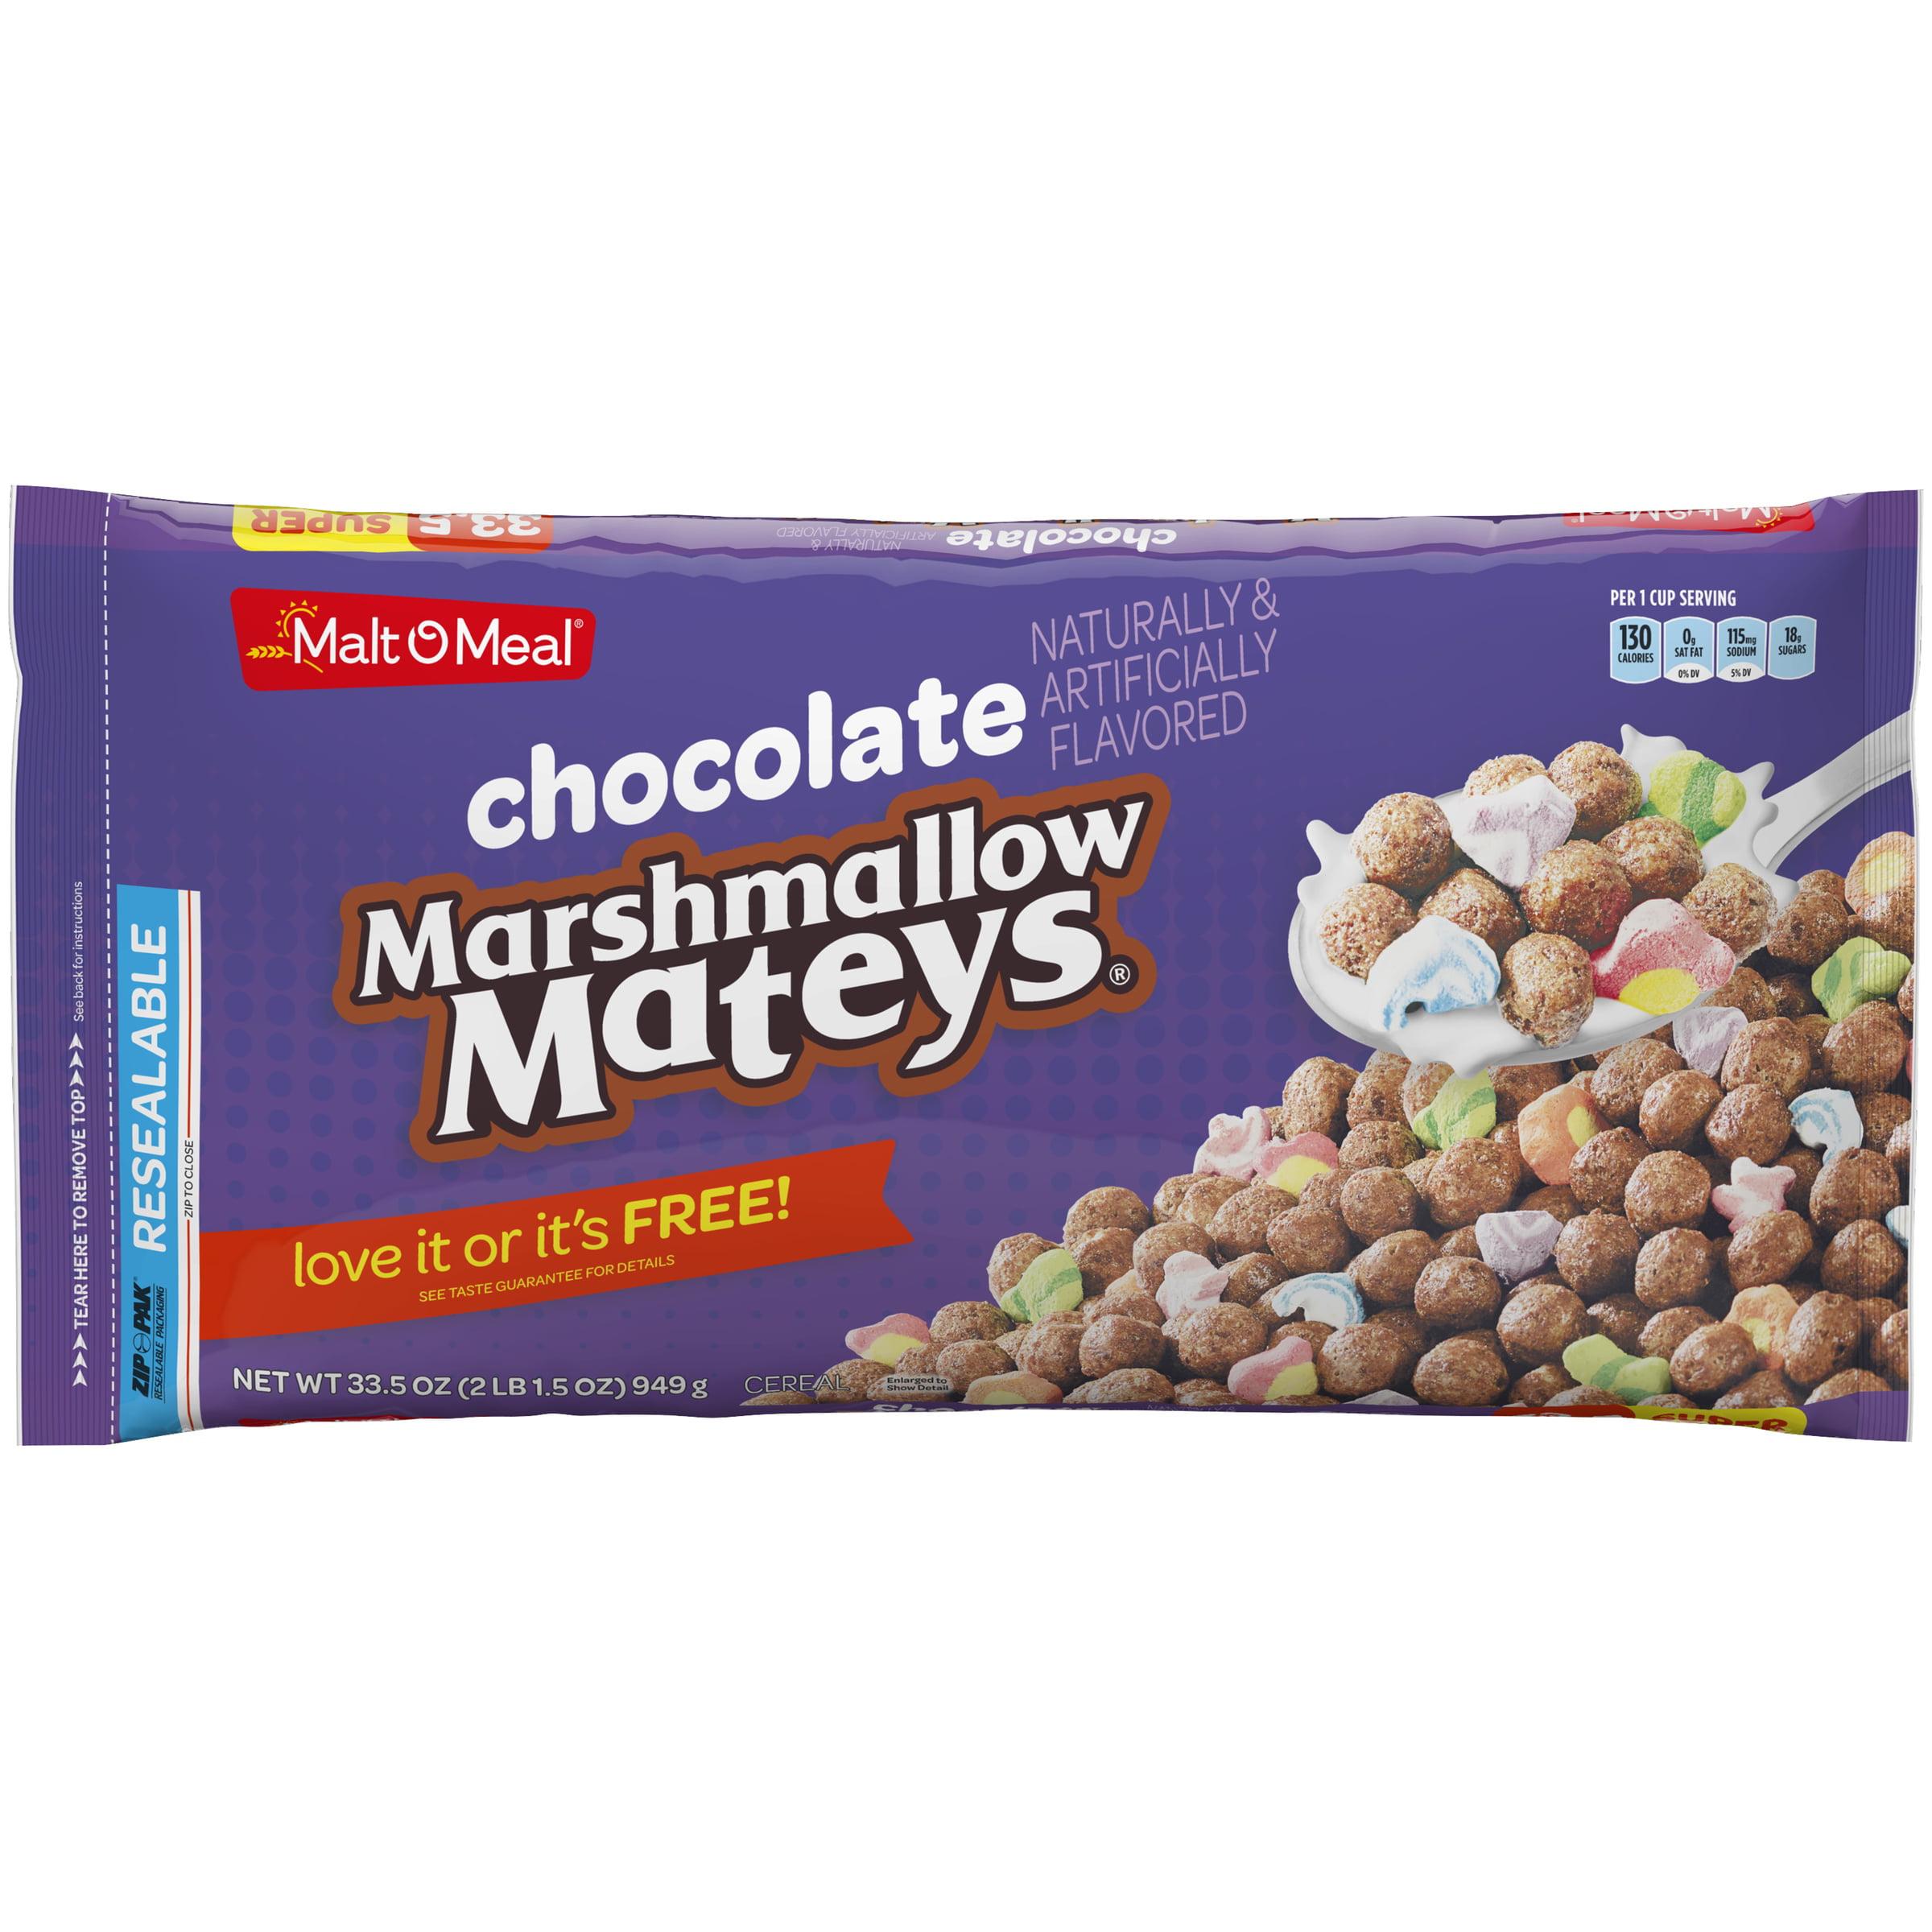 Malt-O-Meal Cereal, Chocolate Marshmallow Mateys, 33.5 Oz